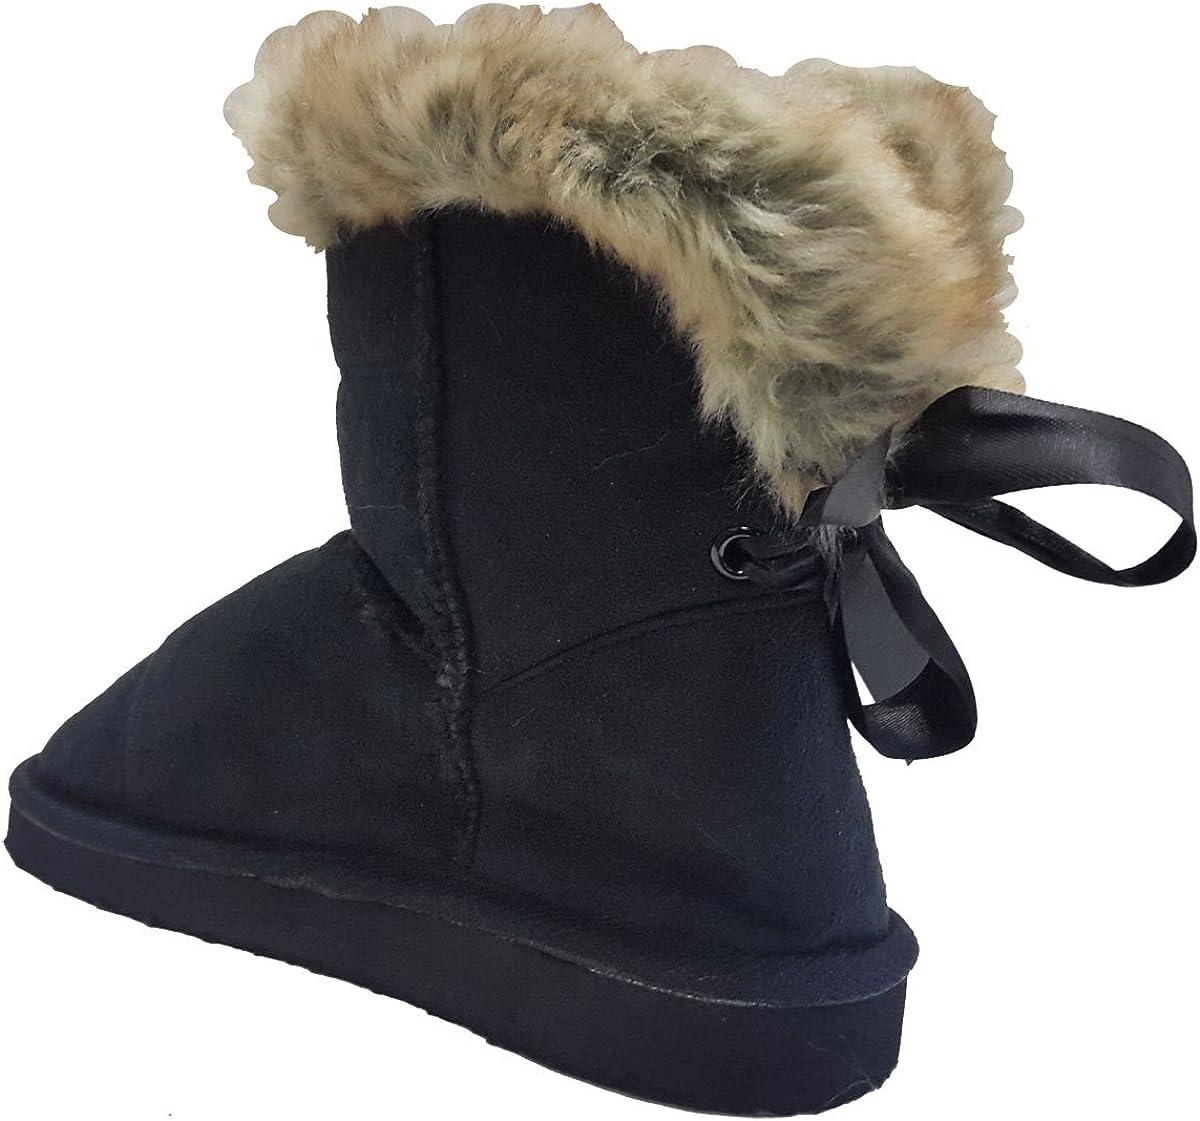 Comfncy Elegant Little Kids Girls Fashion Faux Suede Slip on Ankle Flat Boots